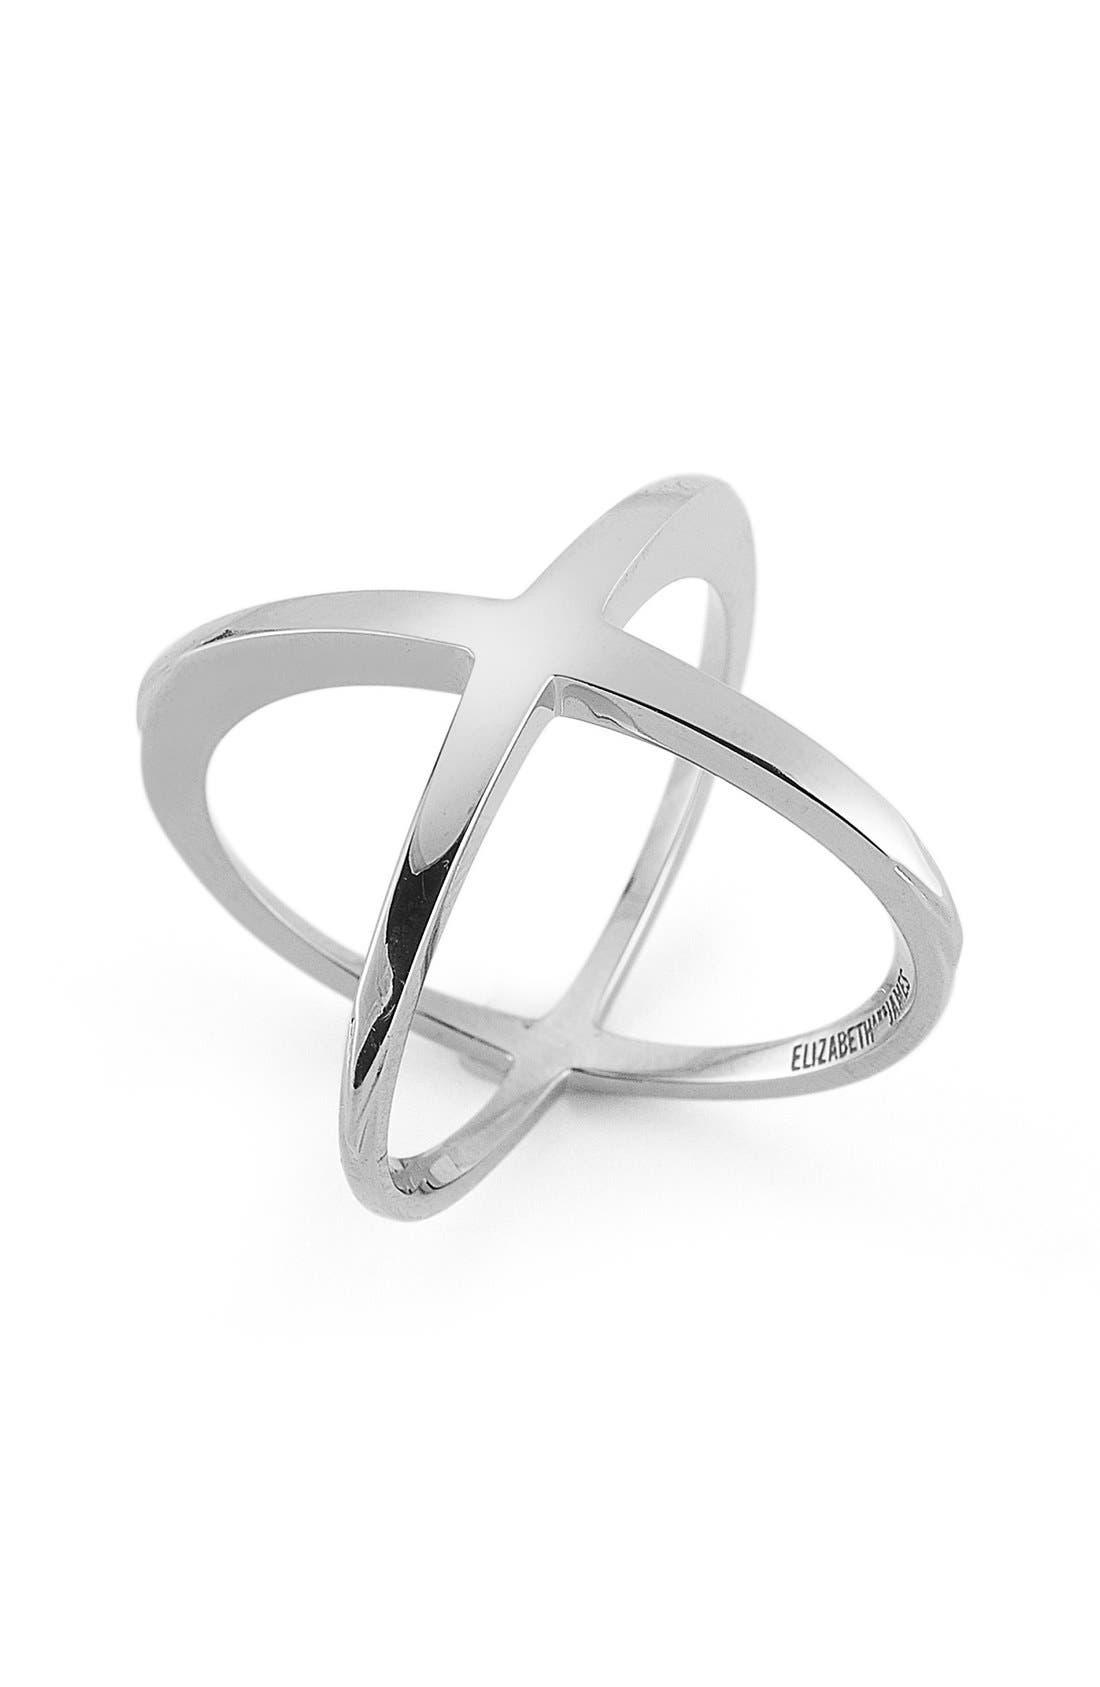 Main Image - Elizabeth and James 'Windrose' Ring